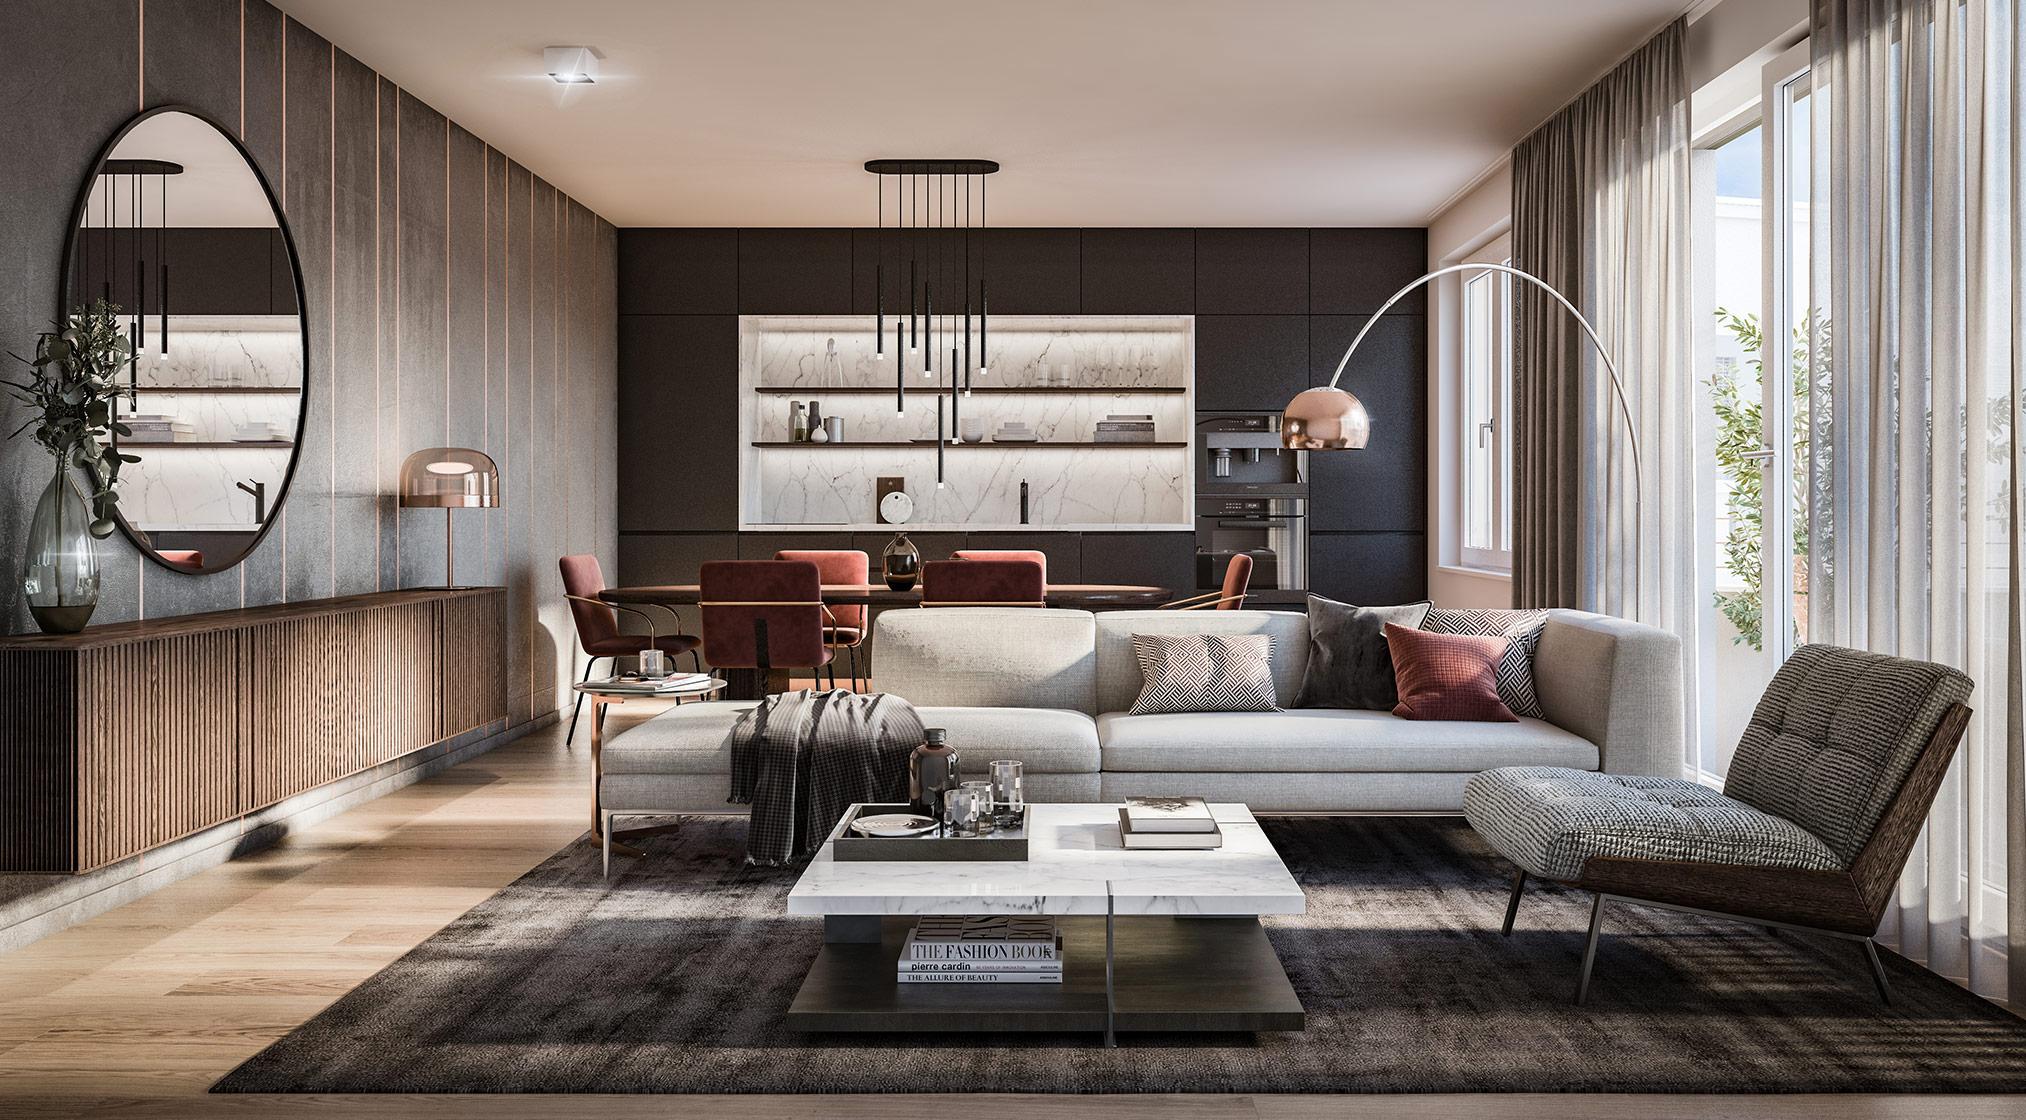 Condominiums Alexisquartier - Das Duett - Project details - illustration 3